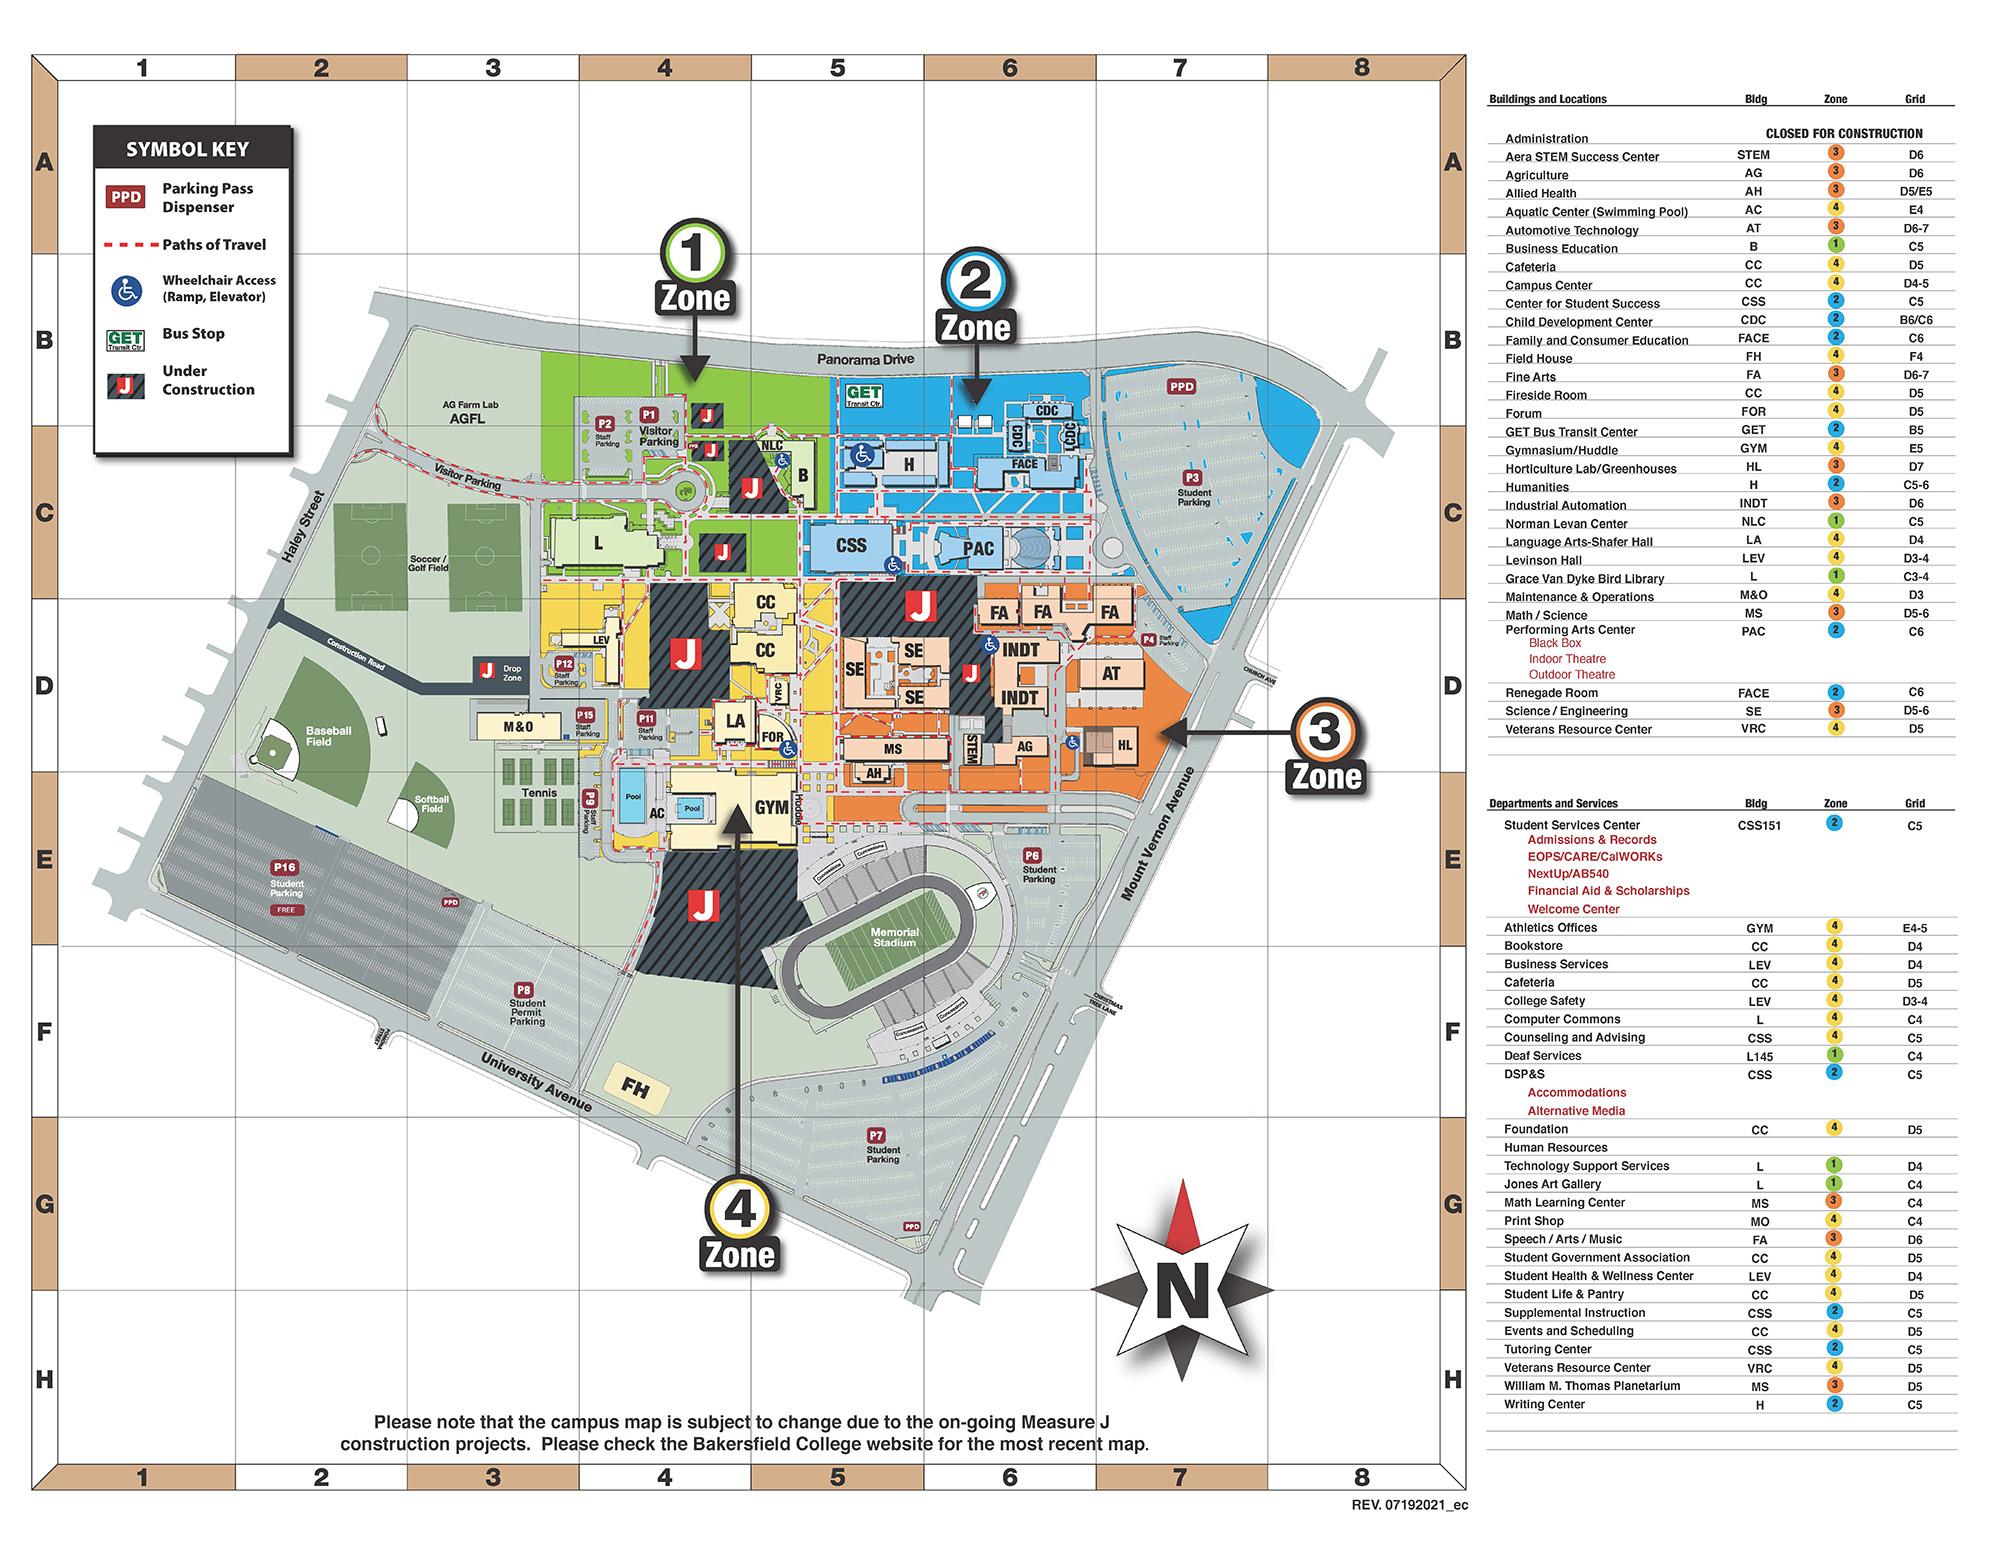 Bakersfield College map